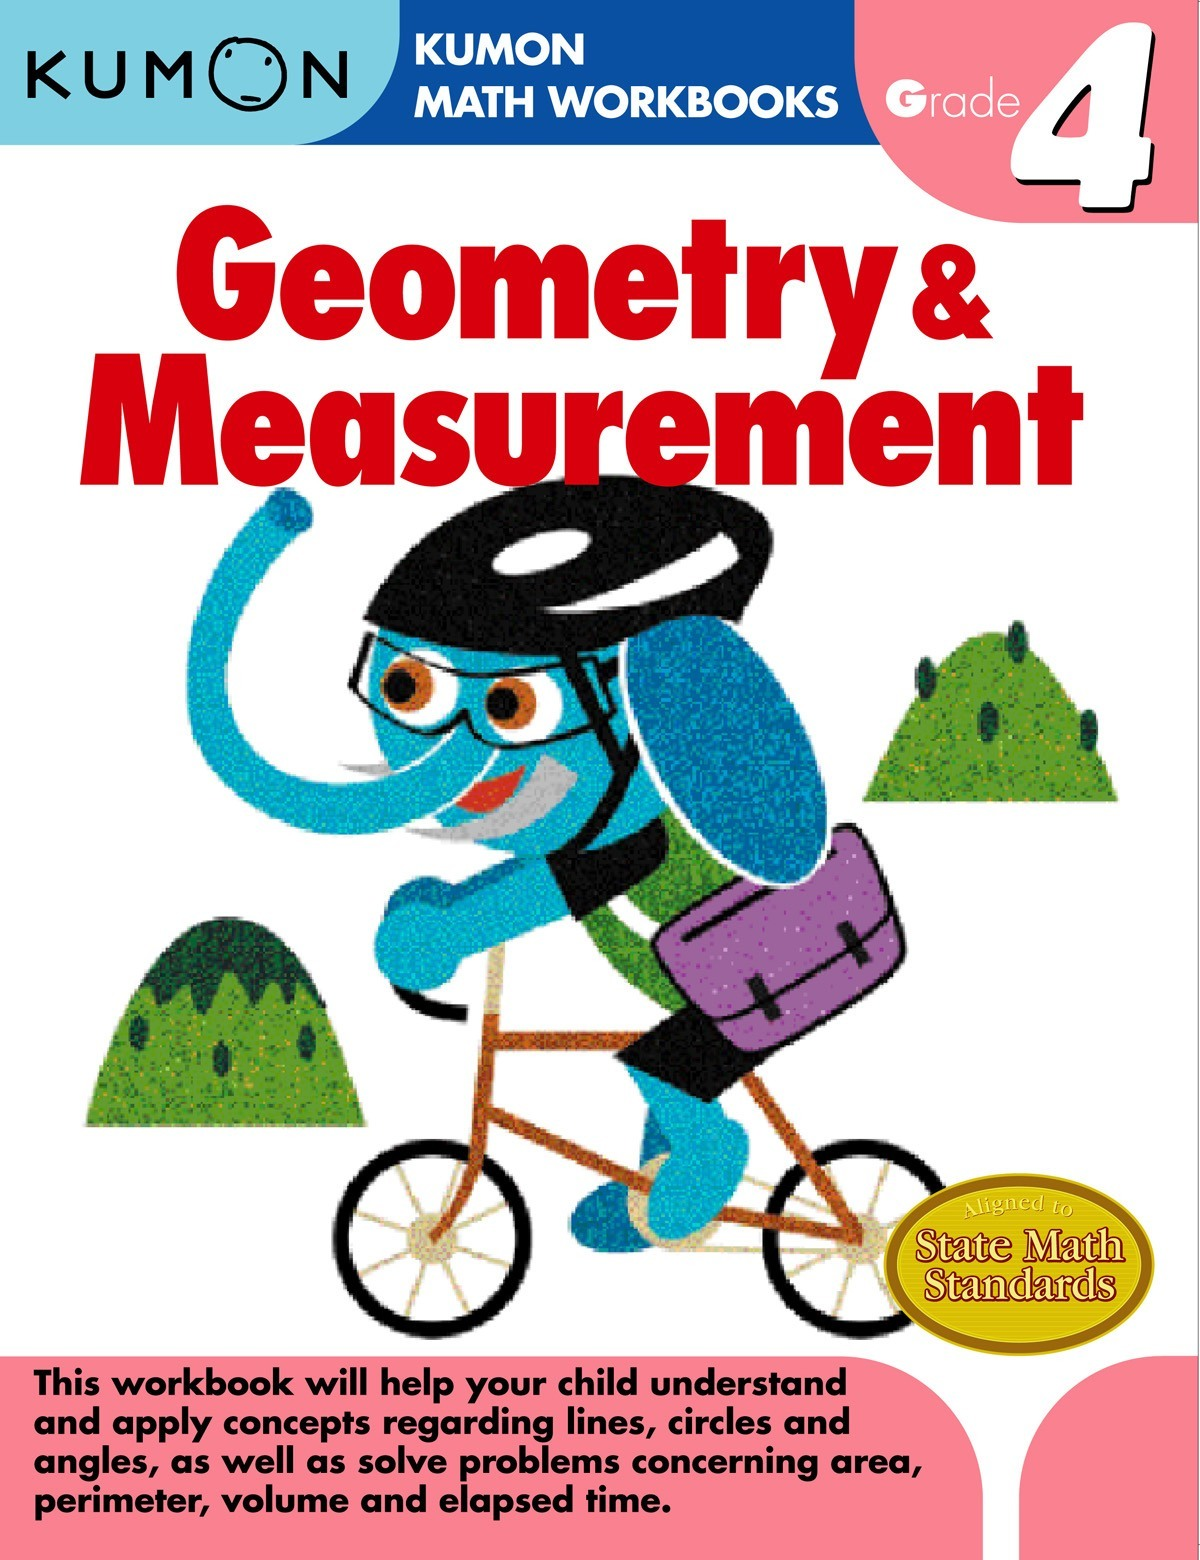 Geometry clipart math book Publishing Grade Workbooks Measurement Kumon